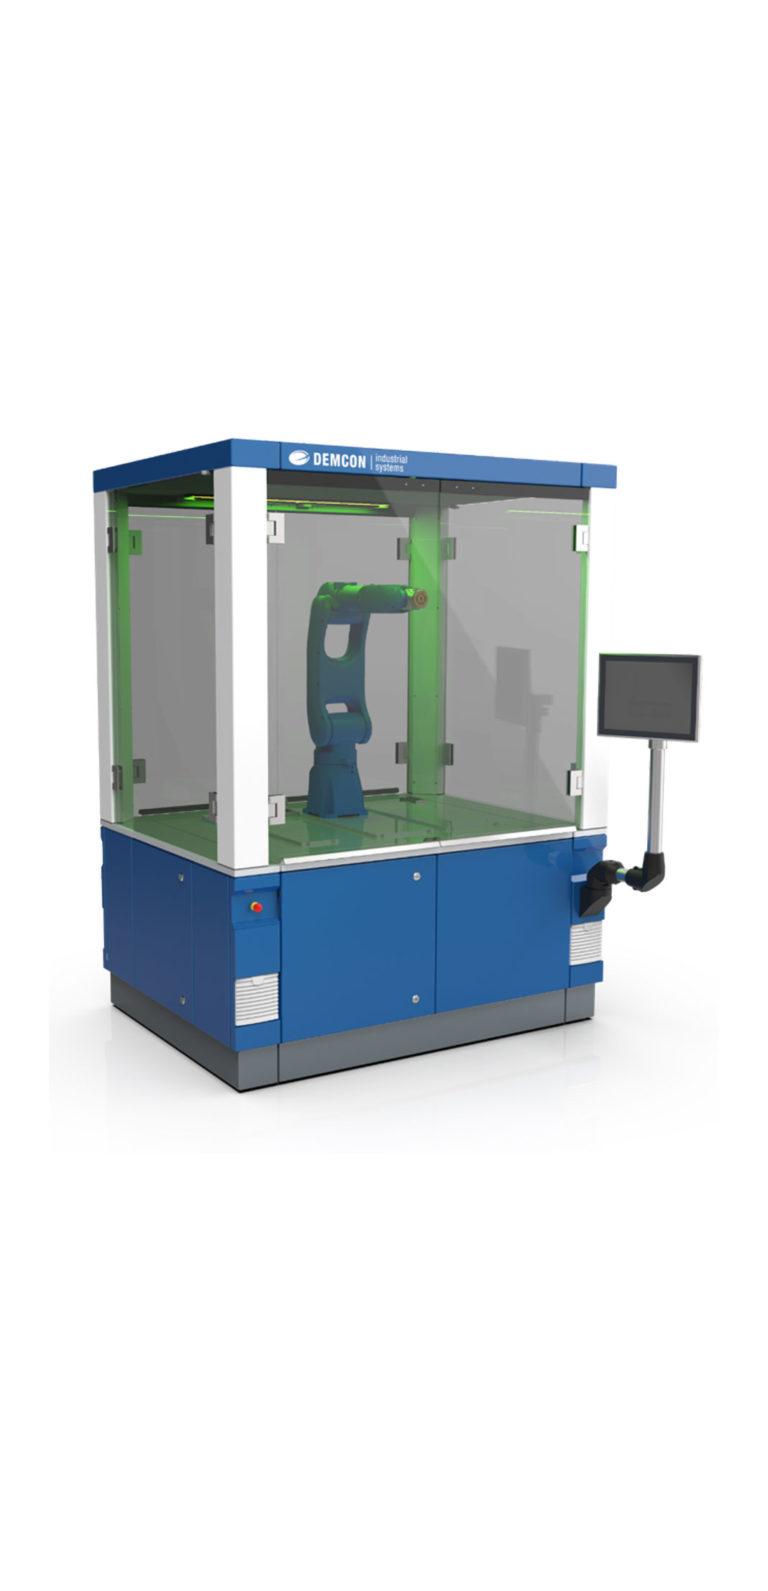 Slider-Case-Smart-Machine-Base-Demcon-6